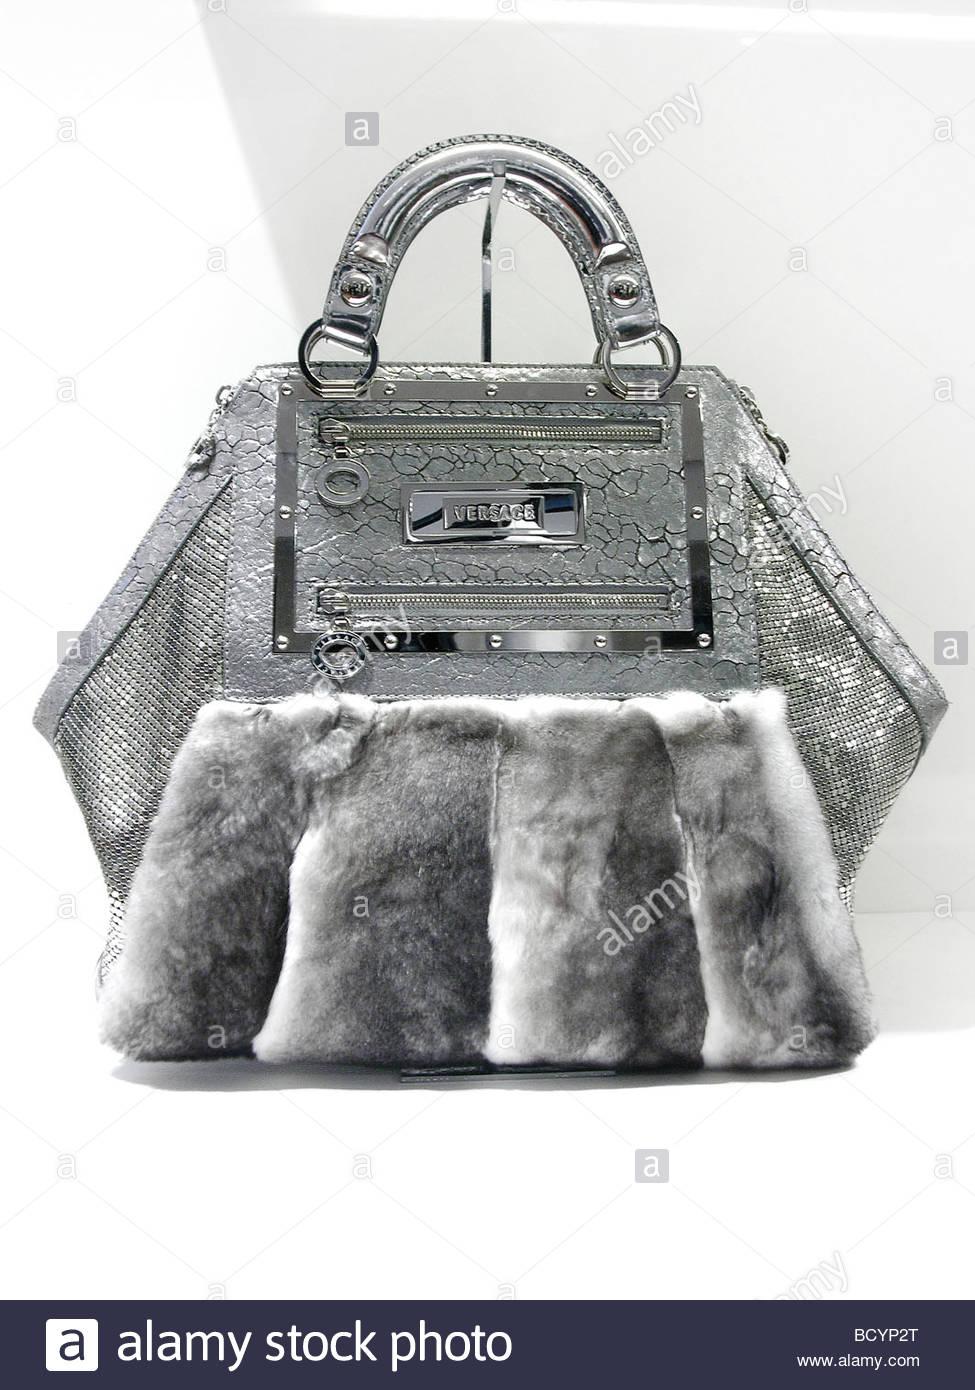 bfa0649a Versace Bags Black White